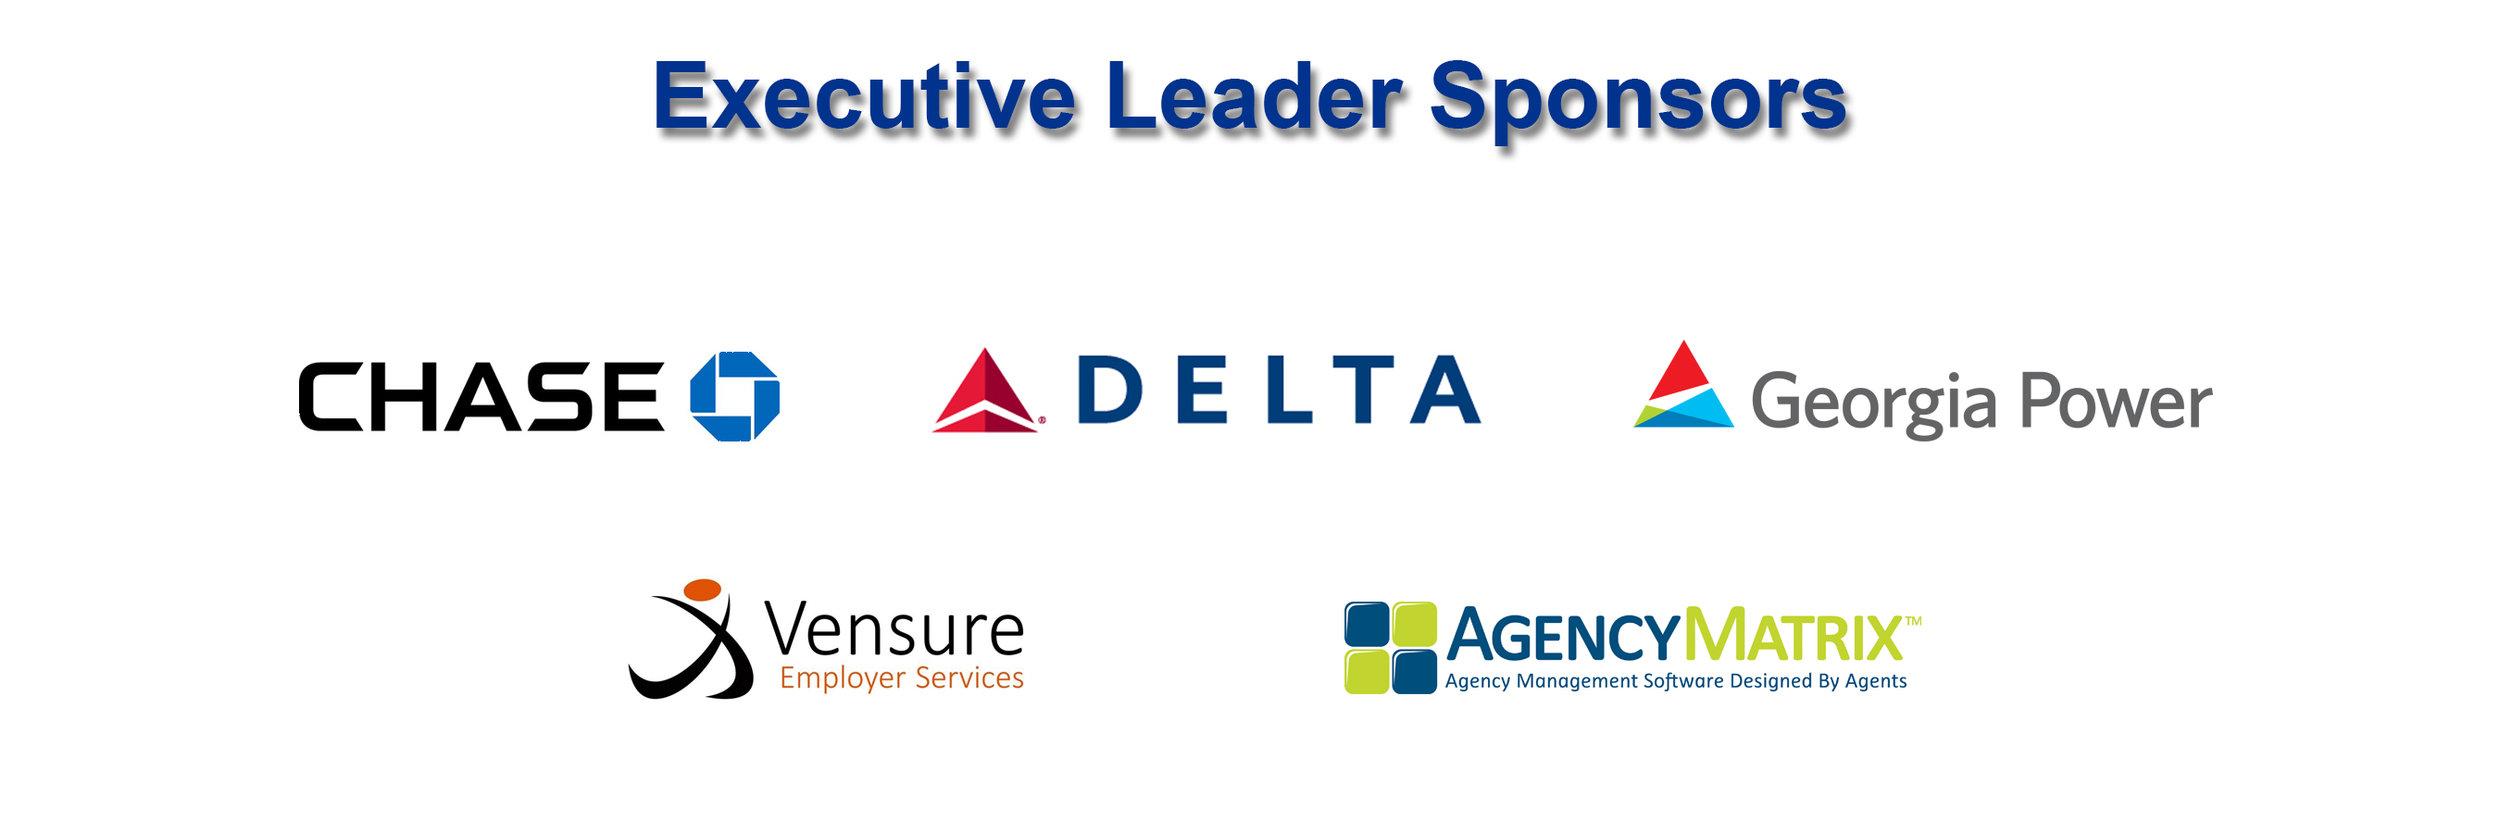 Lat Bus Summit 2018 Executive Leader Sponsors - Long.jpg